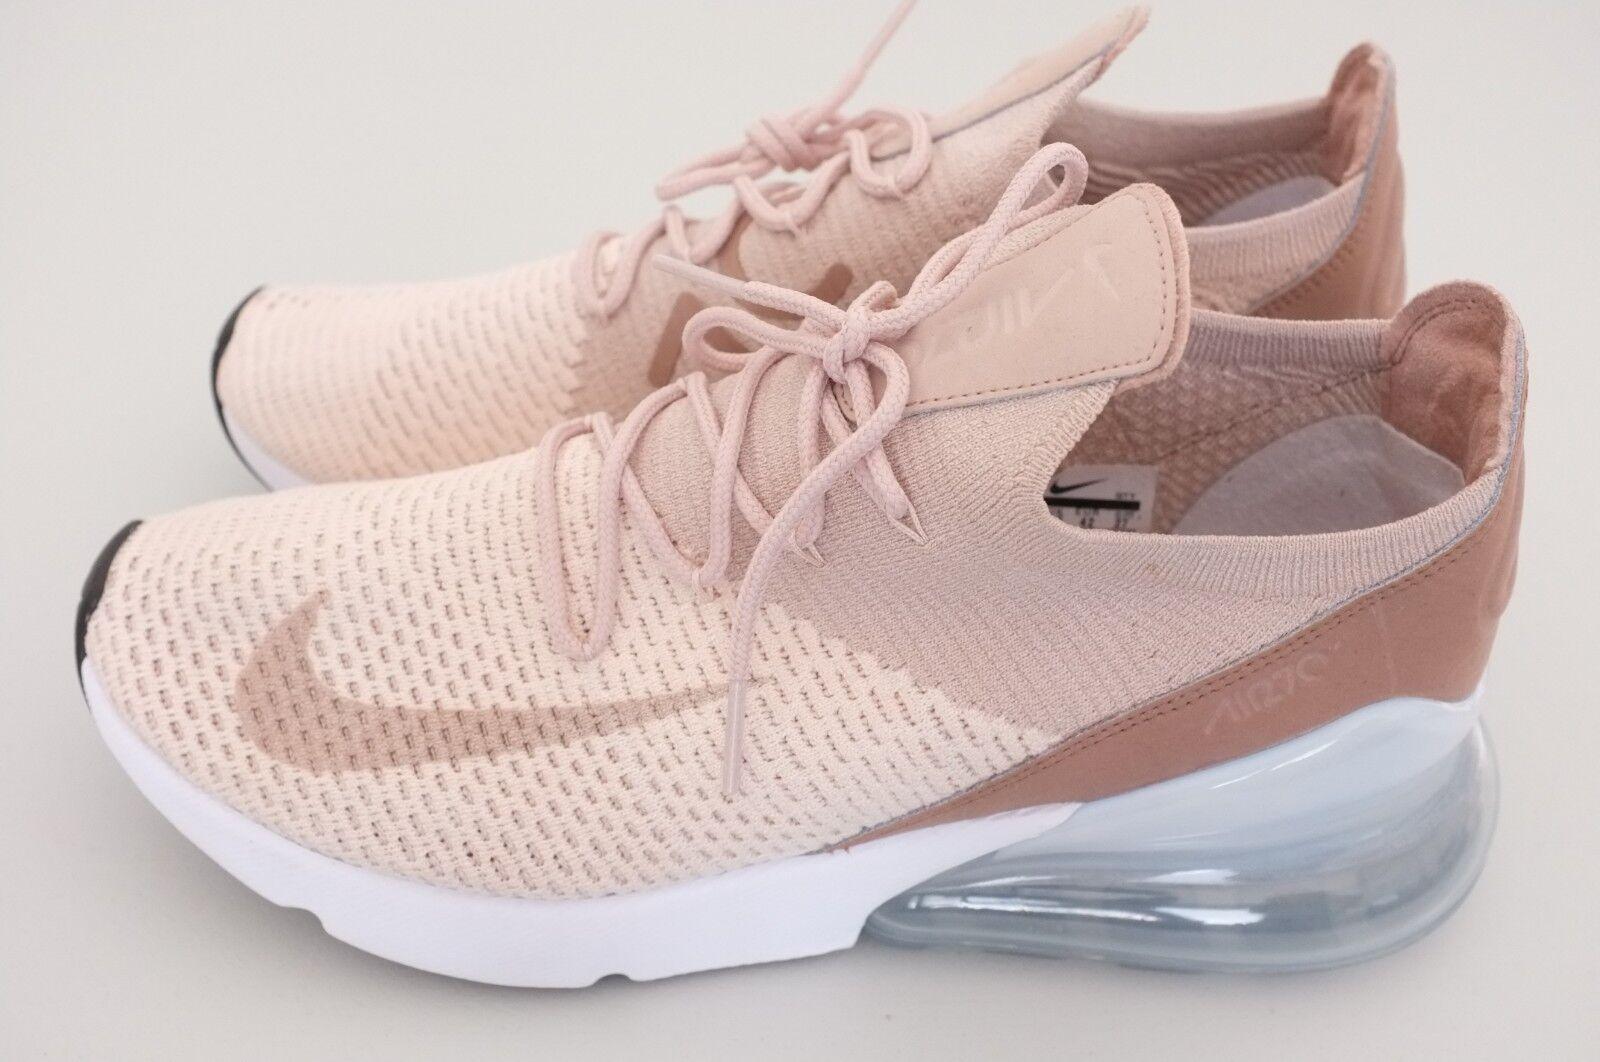 Nuove nike air max 270 donne flyknit scarpe da da da corsa guava ghiaccio sz 10 (ah6803-801) 3a6c19